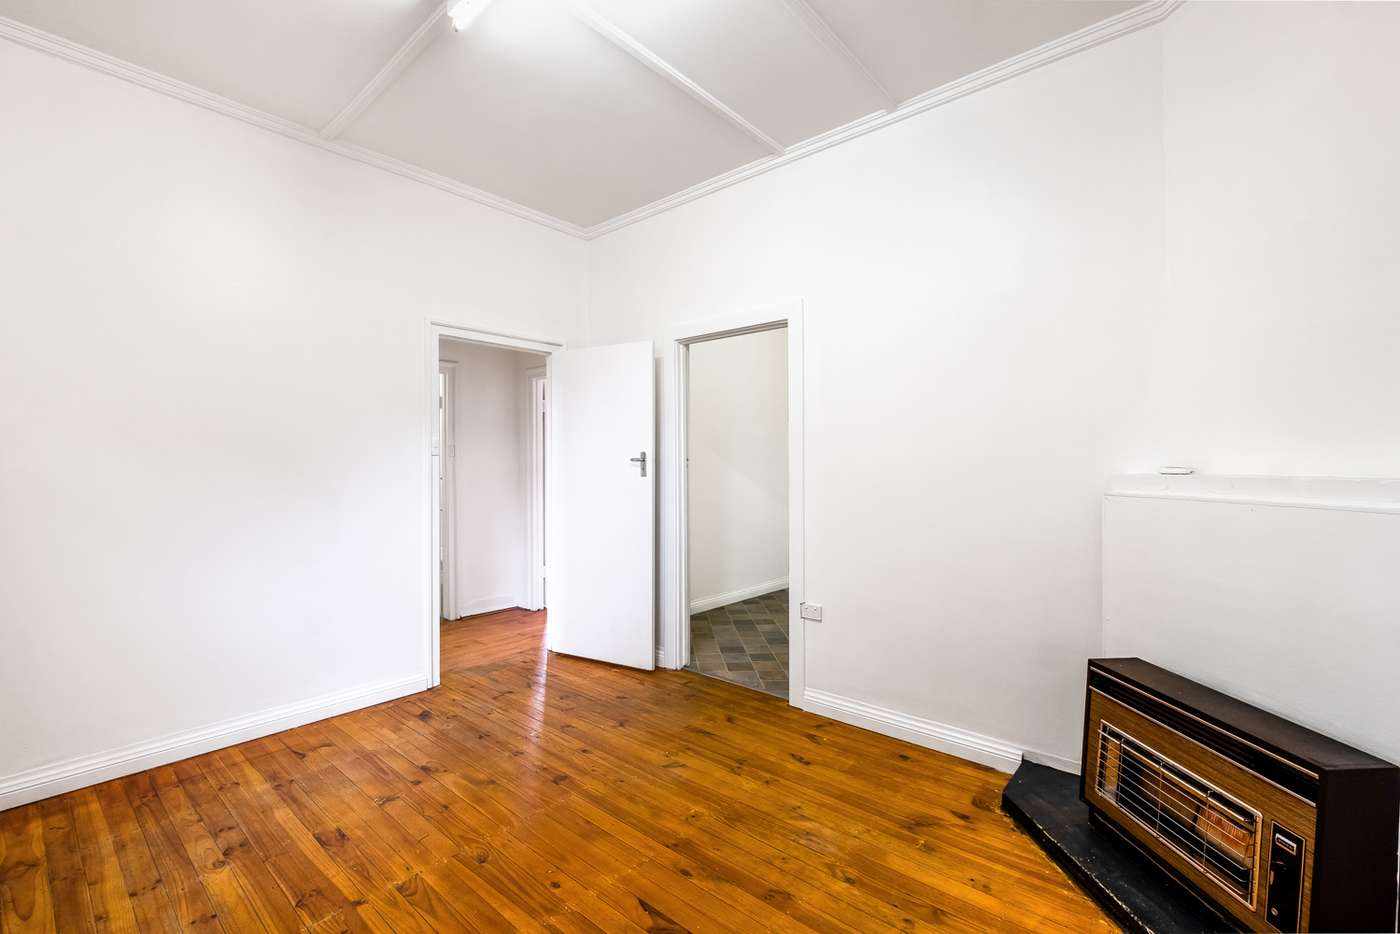 Sixth view of Homely house listing, 86 Blight Street, Ridleyton SA 5008